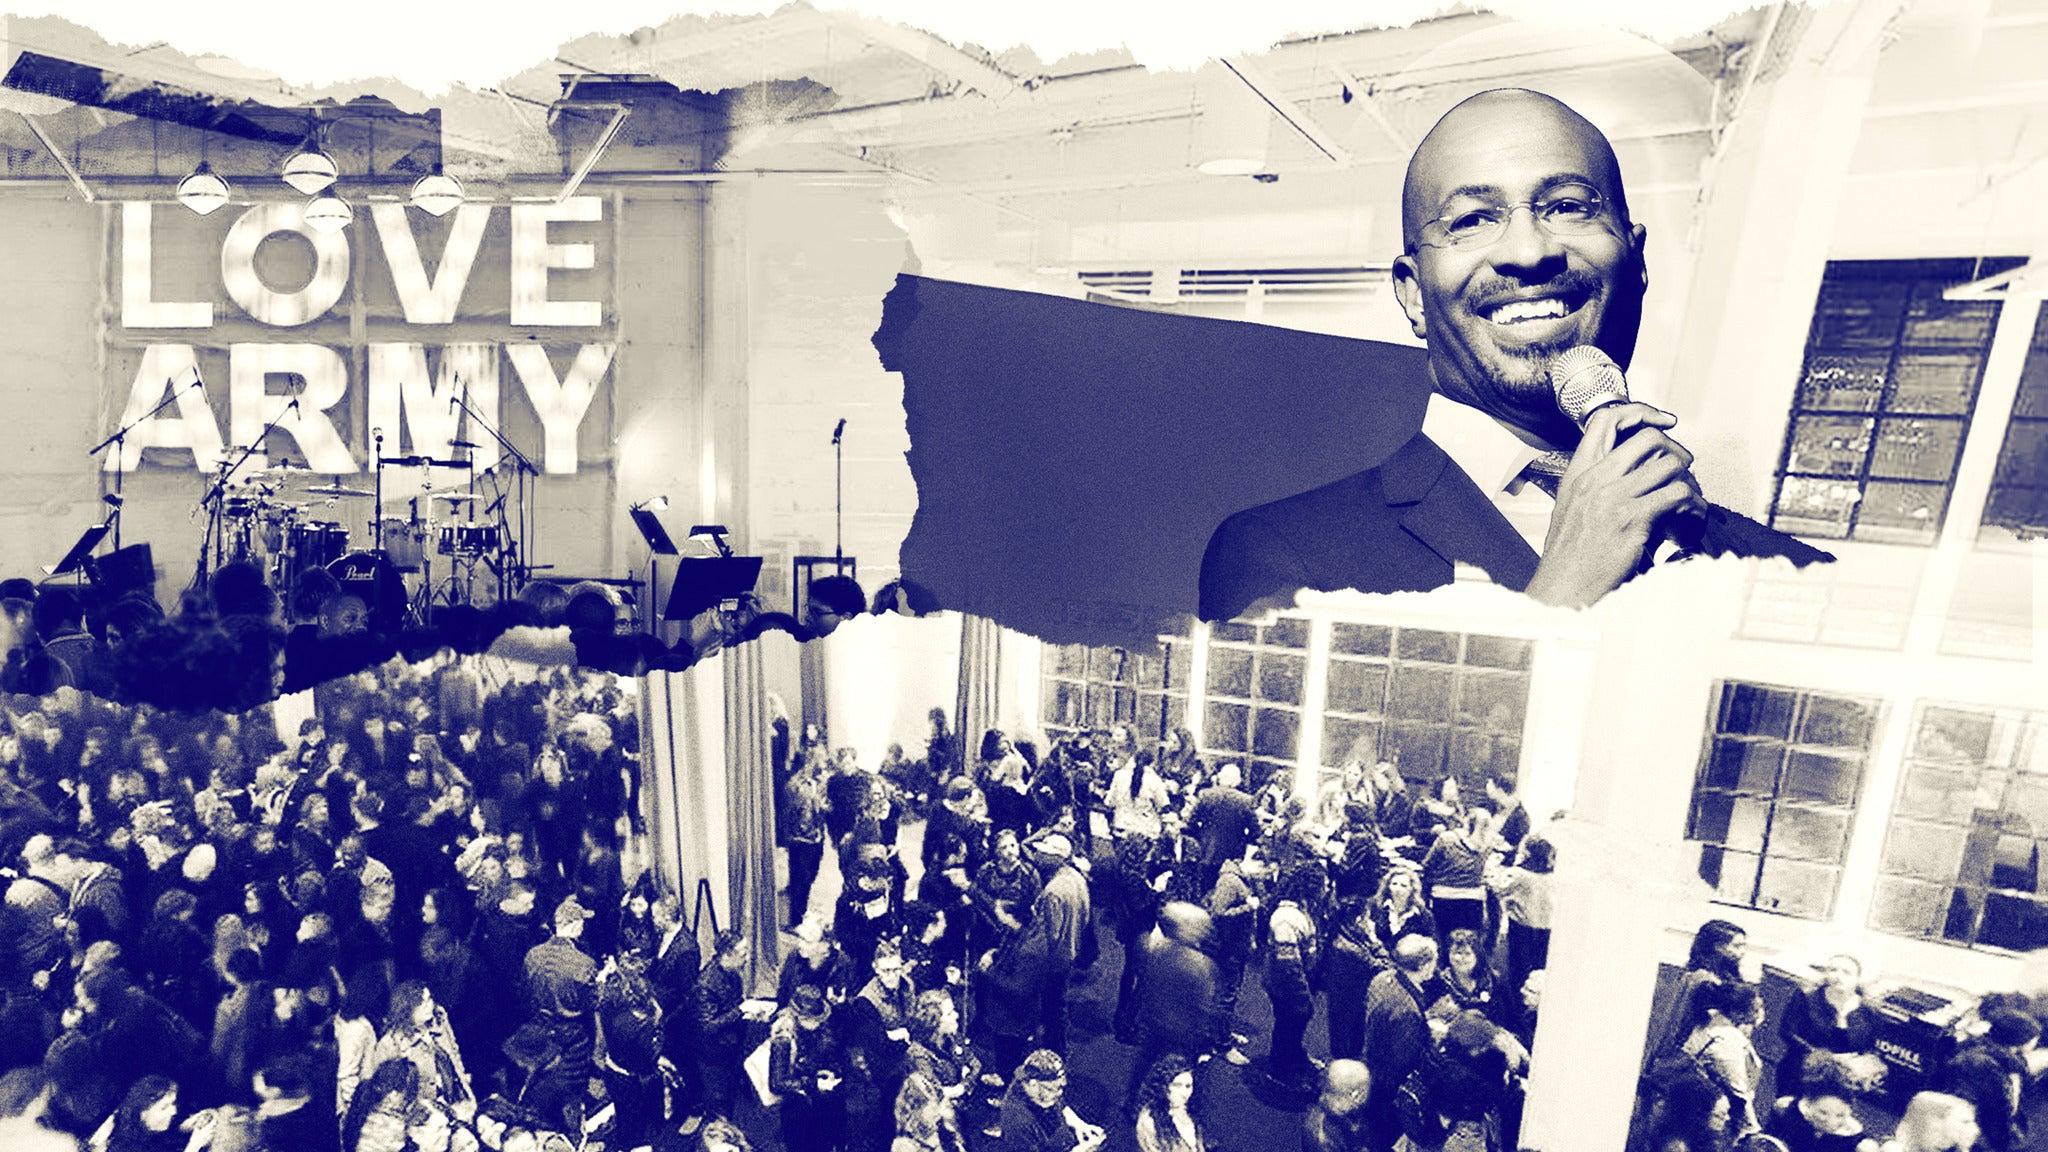 Van Jones: We Rise Tour powered by #LoveArmy